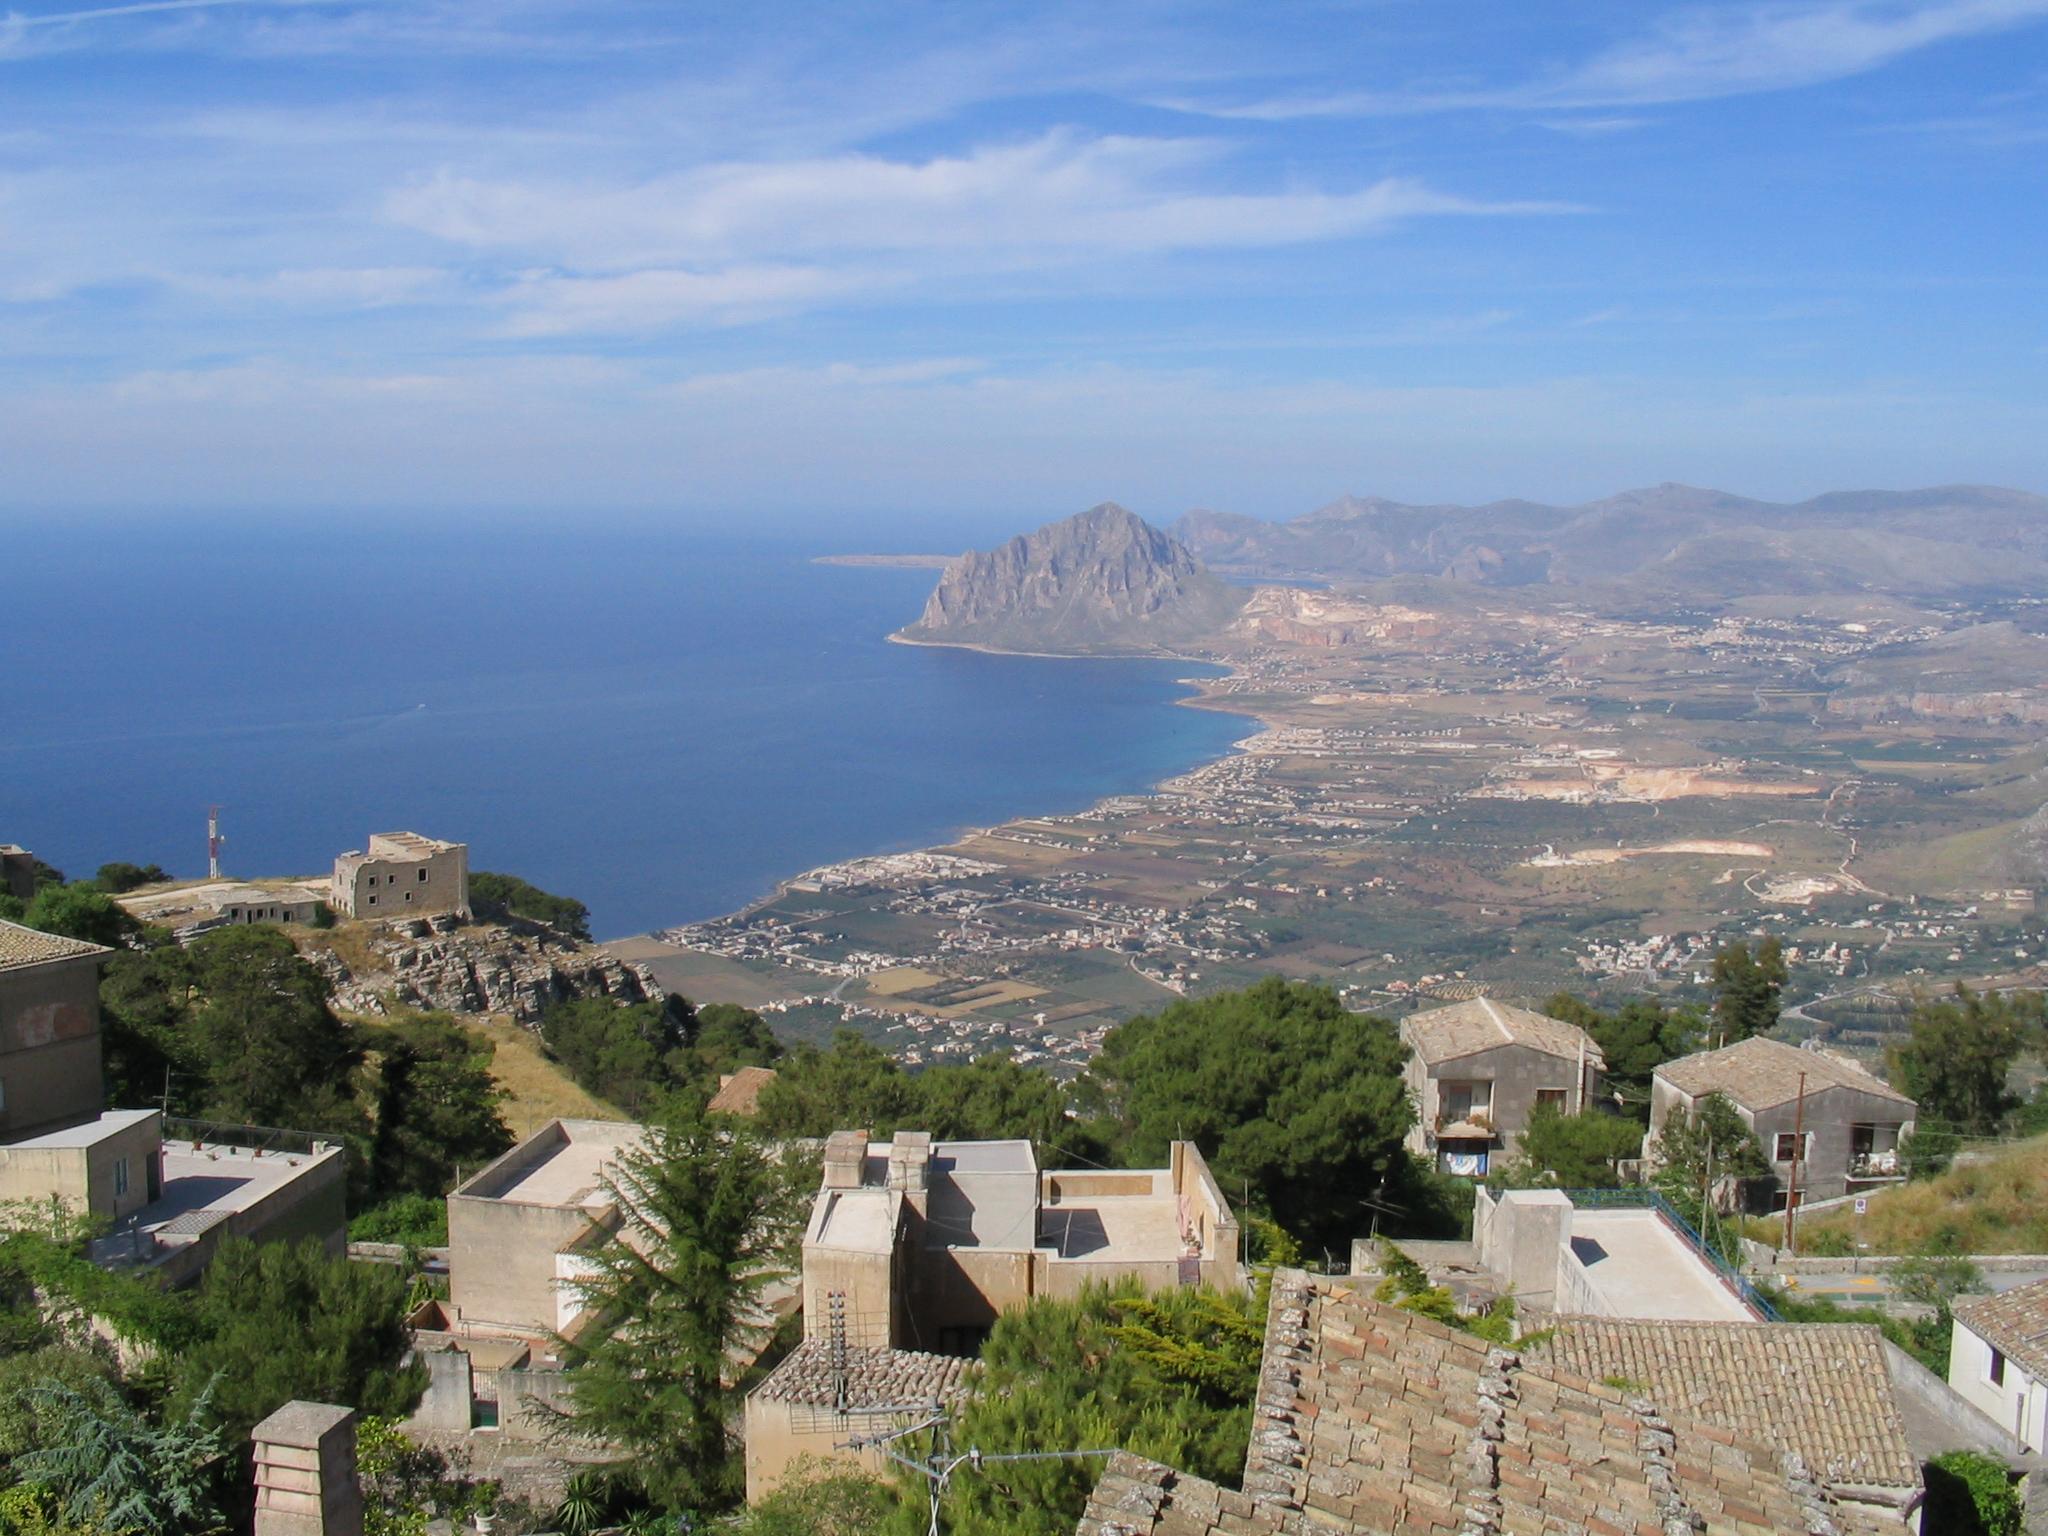 Castelvetrano Italy  city pictures gallery : Erice Sicily Italy 34 Wikipedia, the free encyclopedia